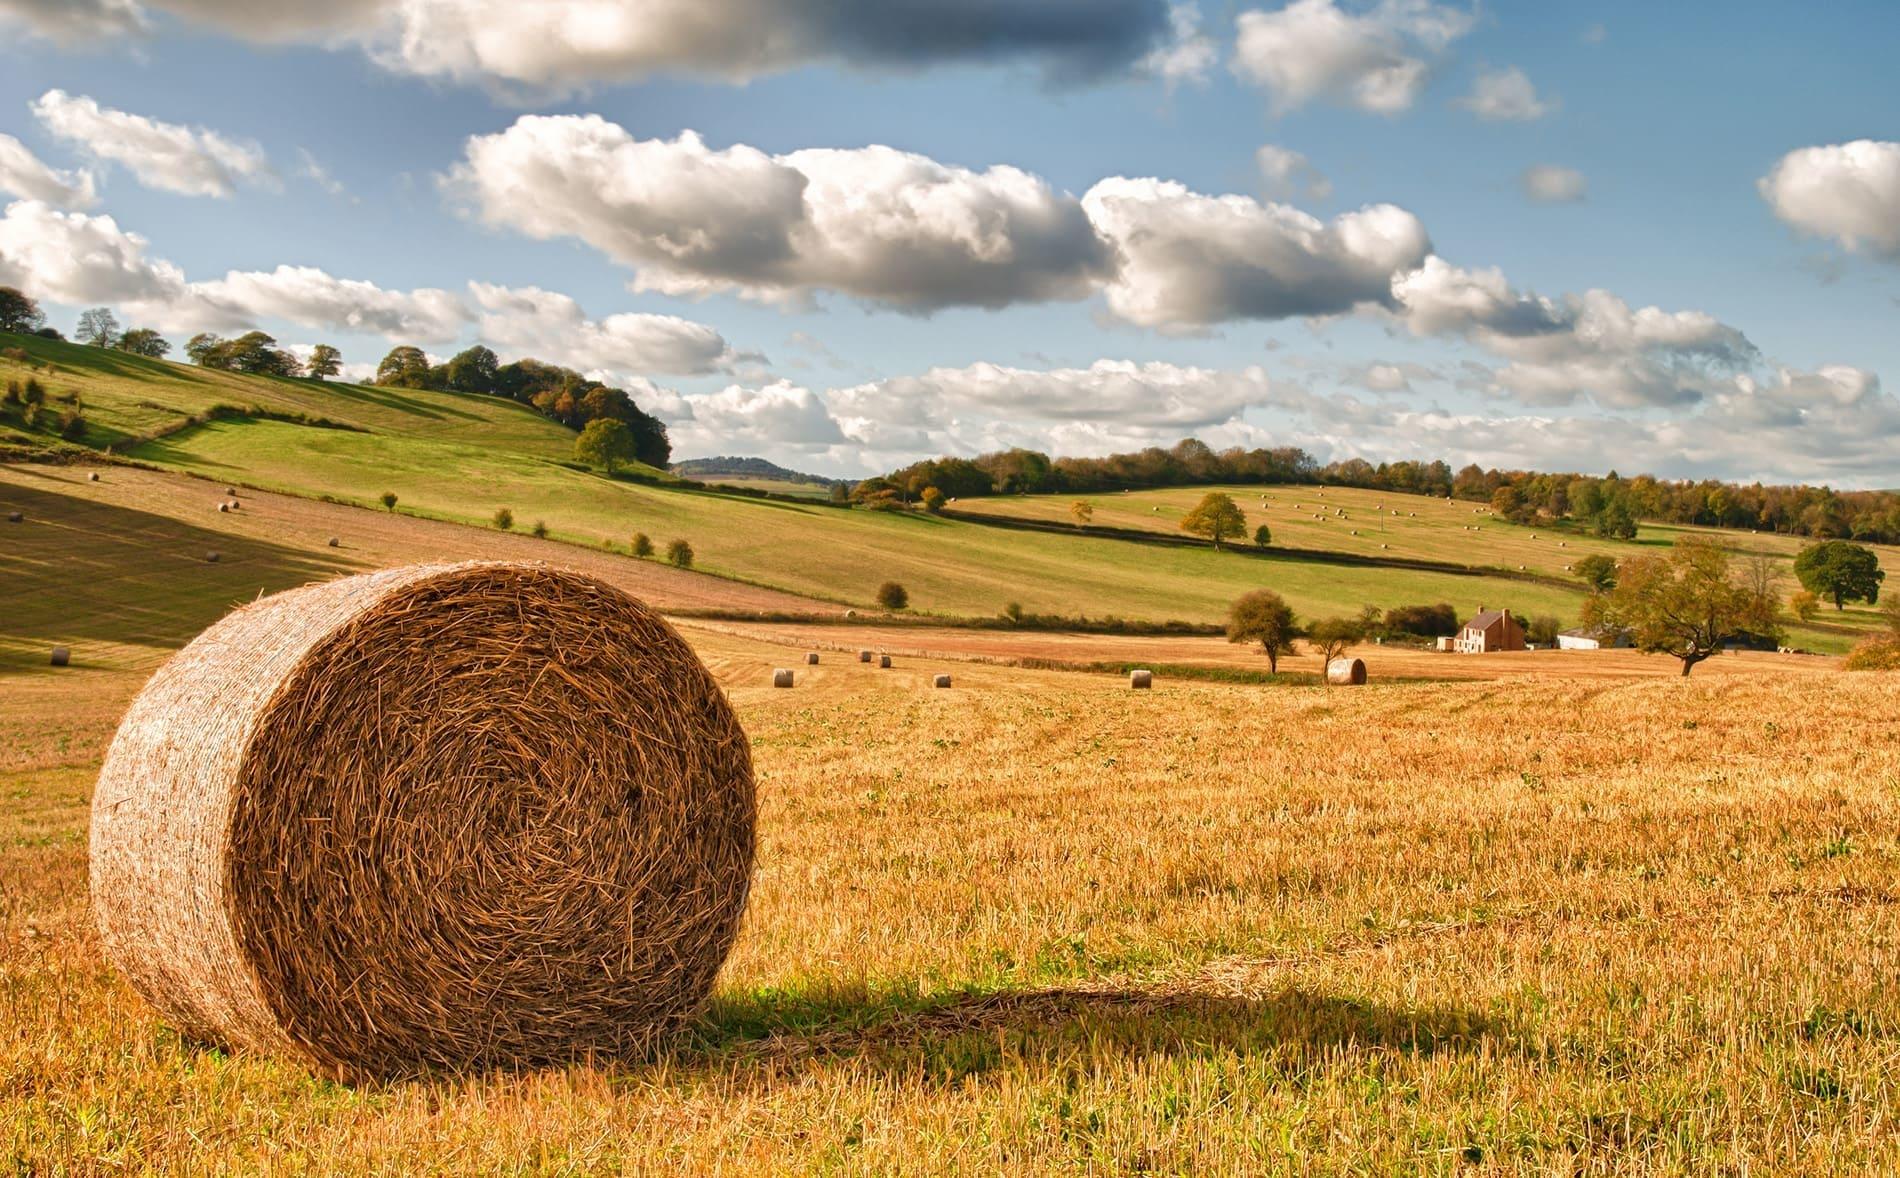 McCartneys Agriculture grass keep